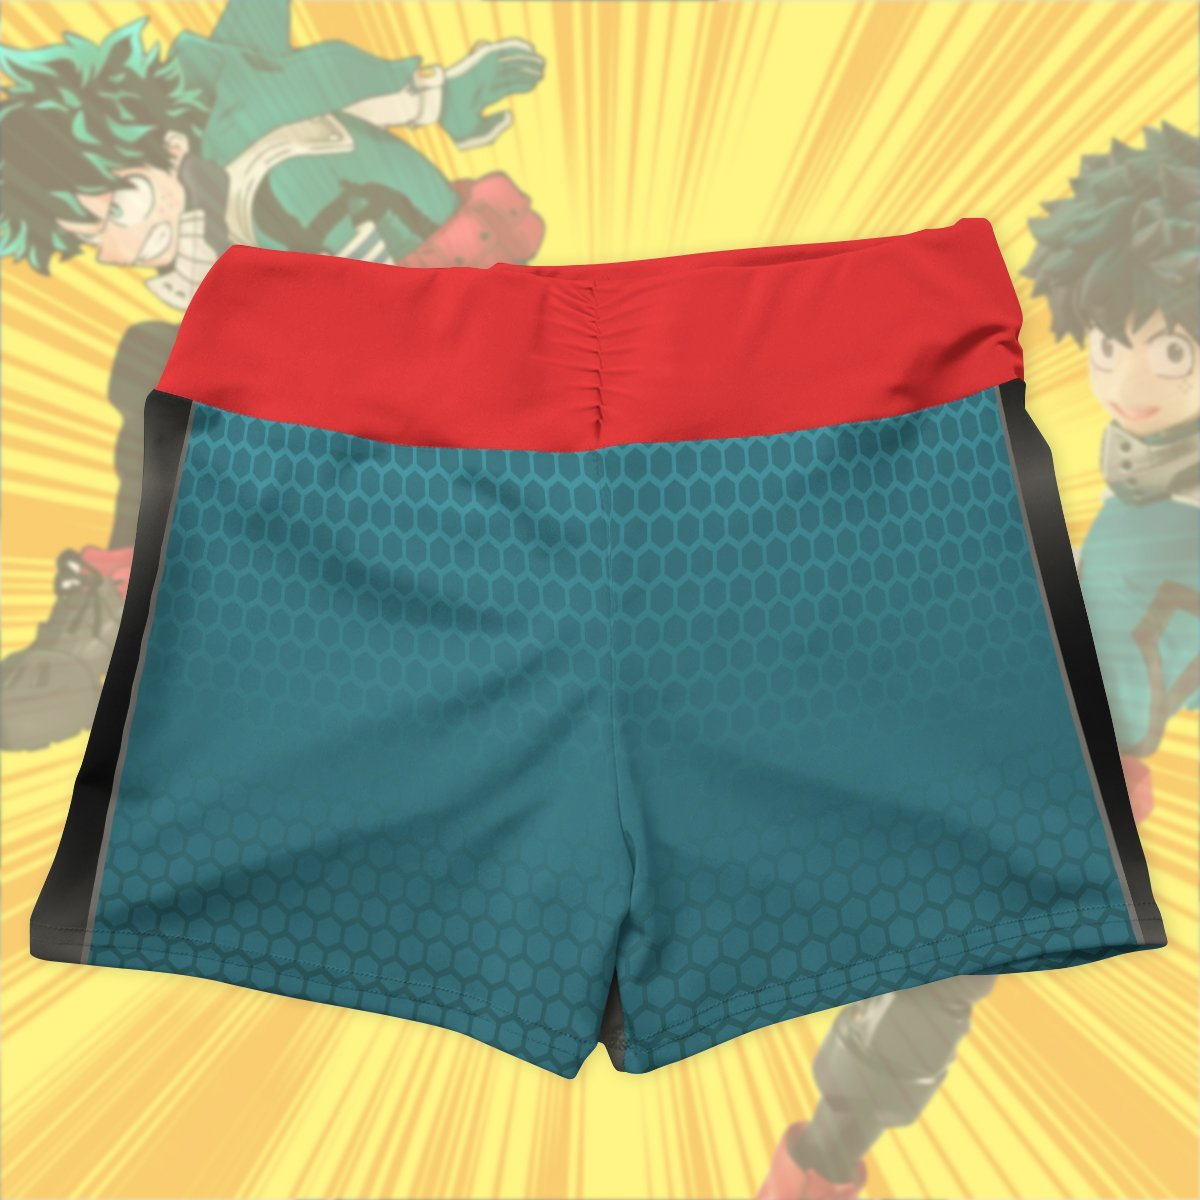 ua high izuku active wear set 774358 - Anime Swimsuits